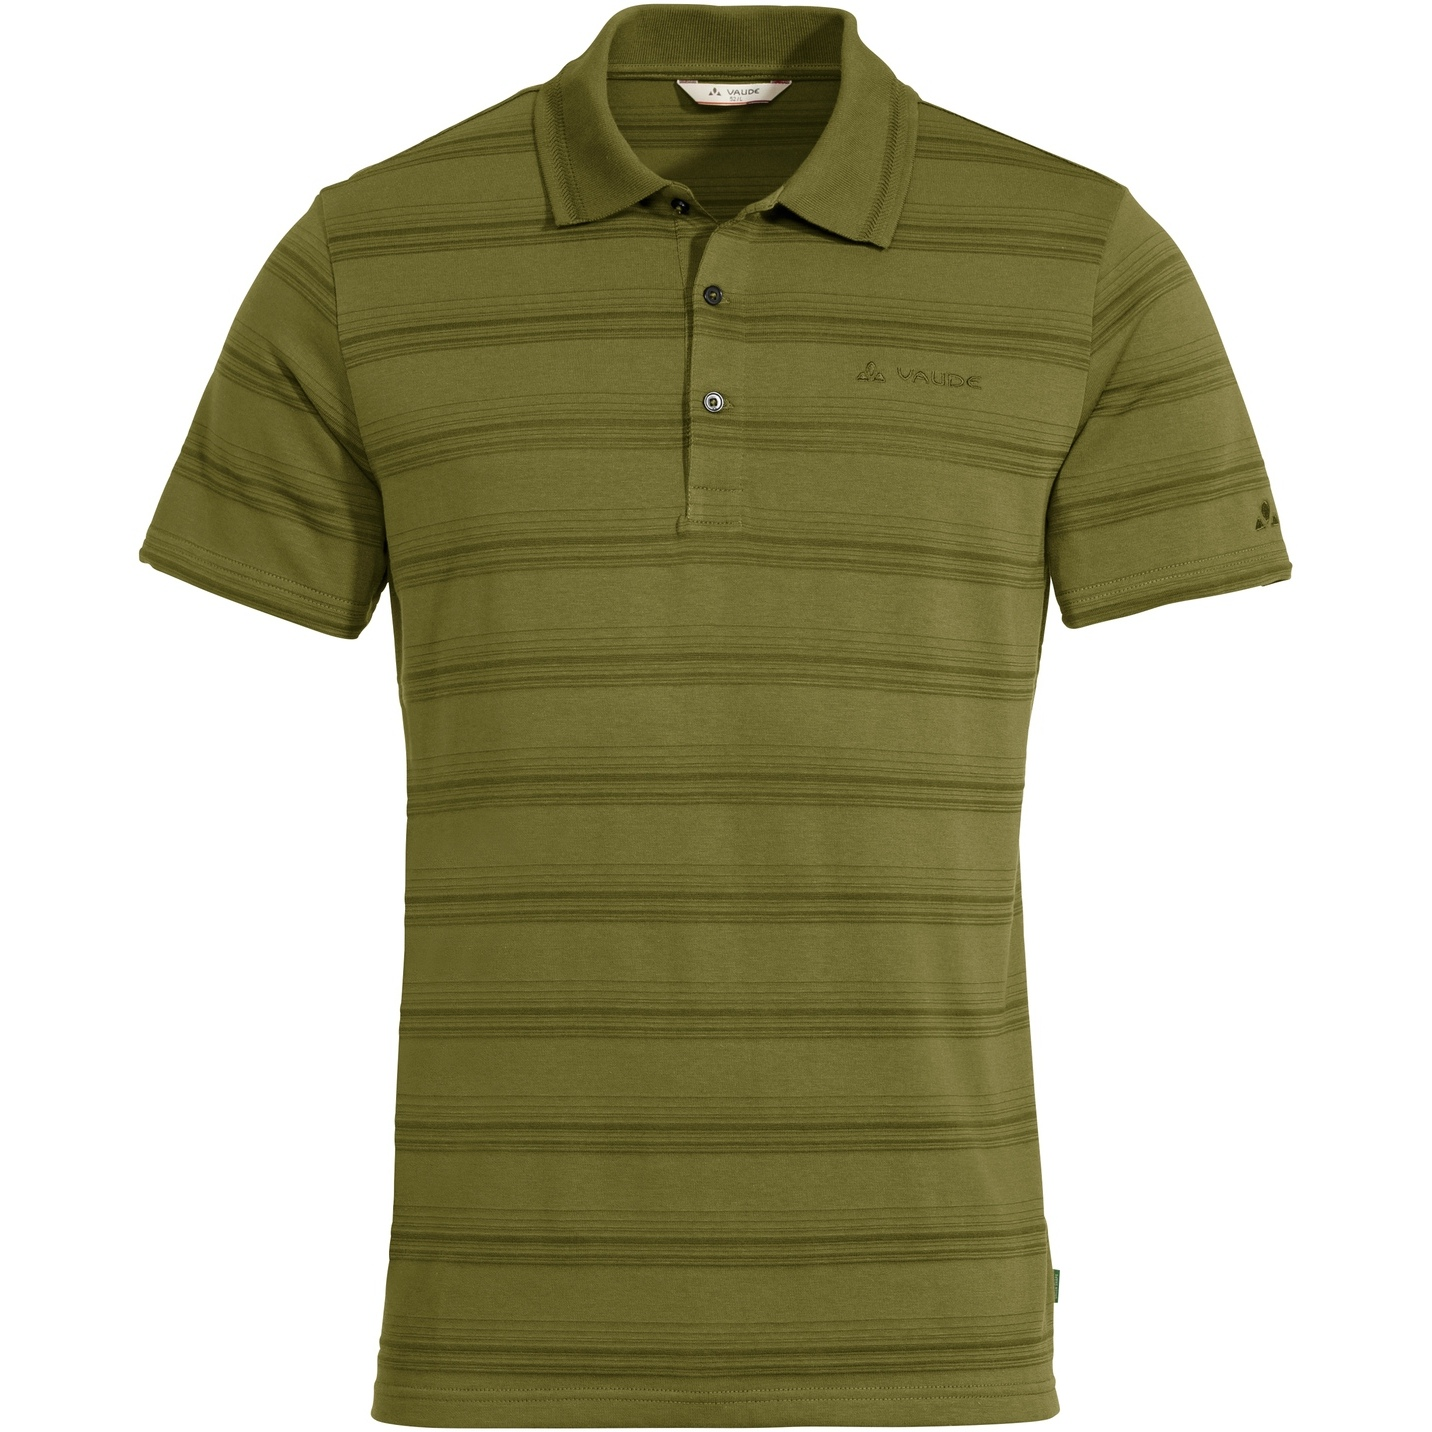 Vaude Labisco Poloshirt II - bamboo